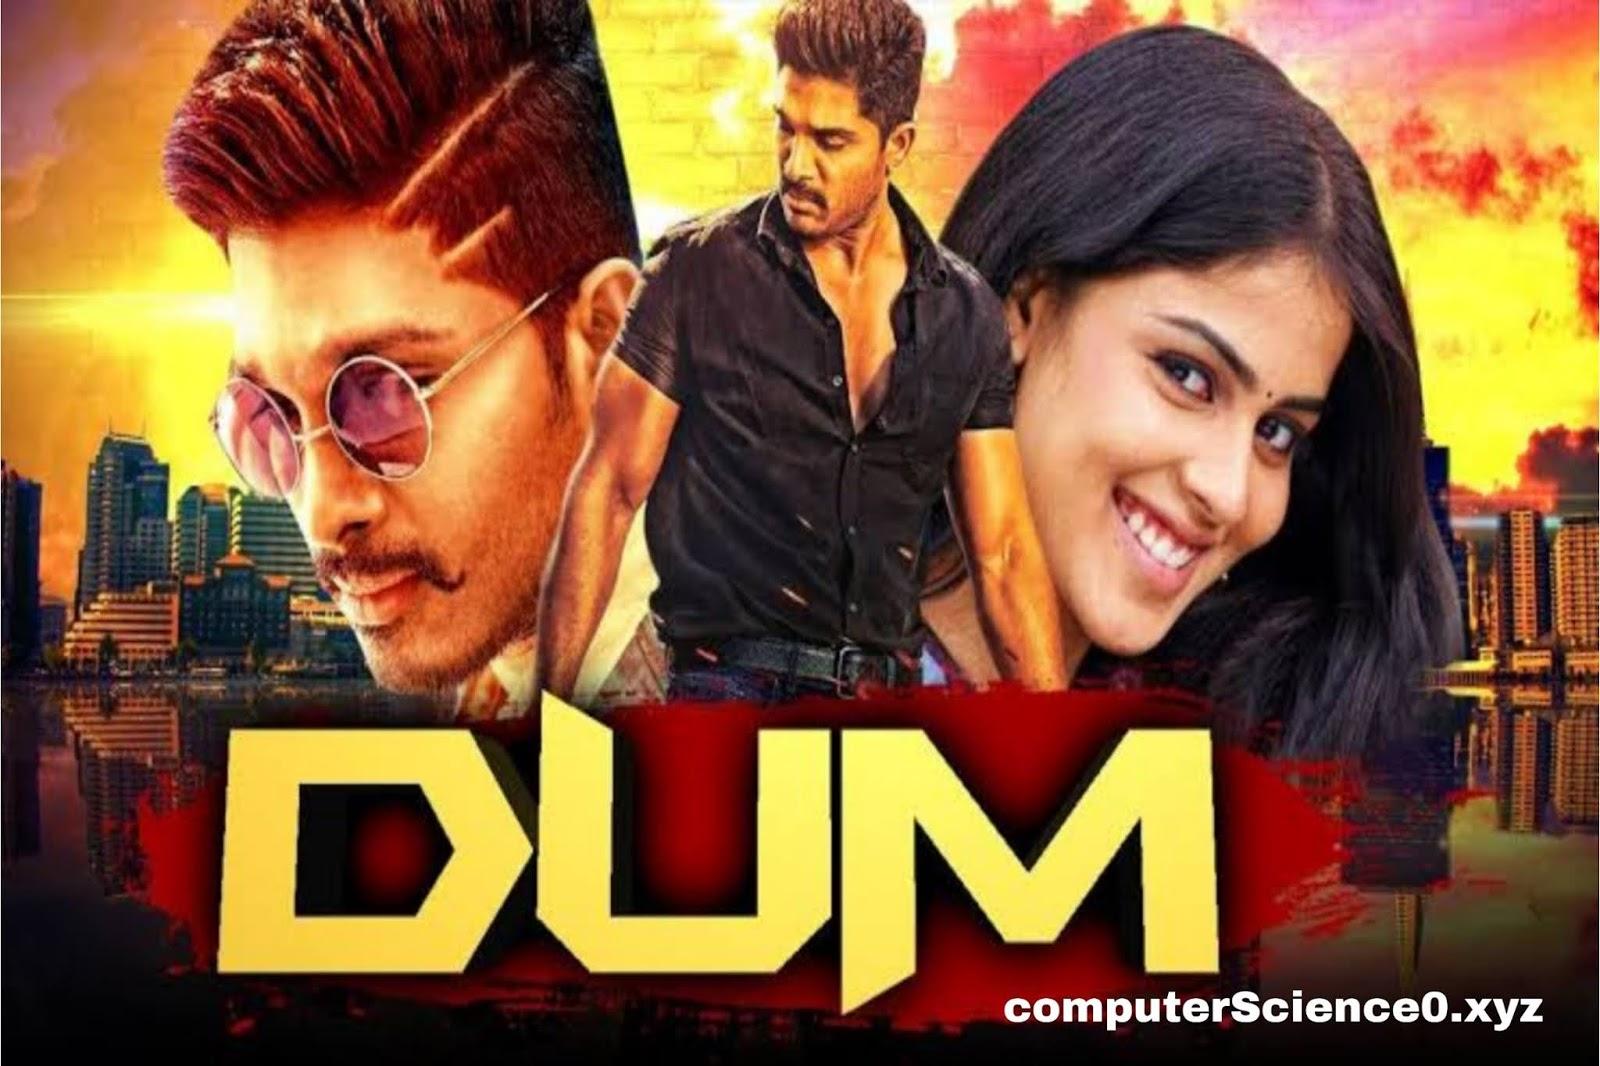 Happy, Be Happy, Dum Allu Arjun's Top 19 movies of all time